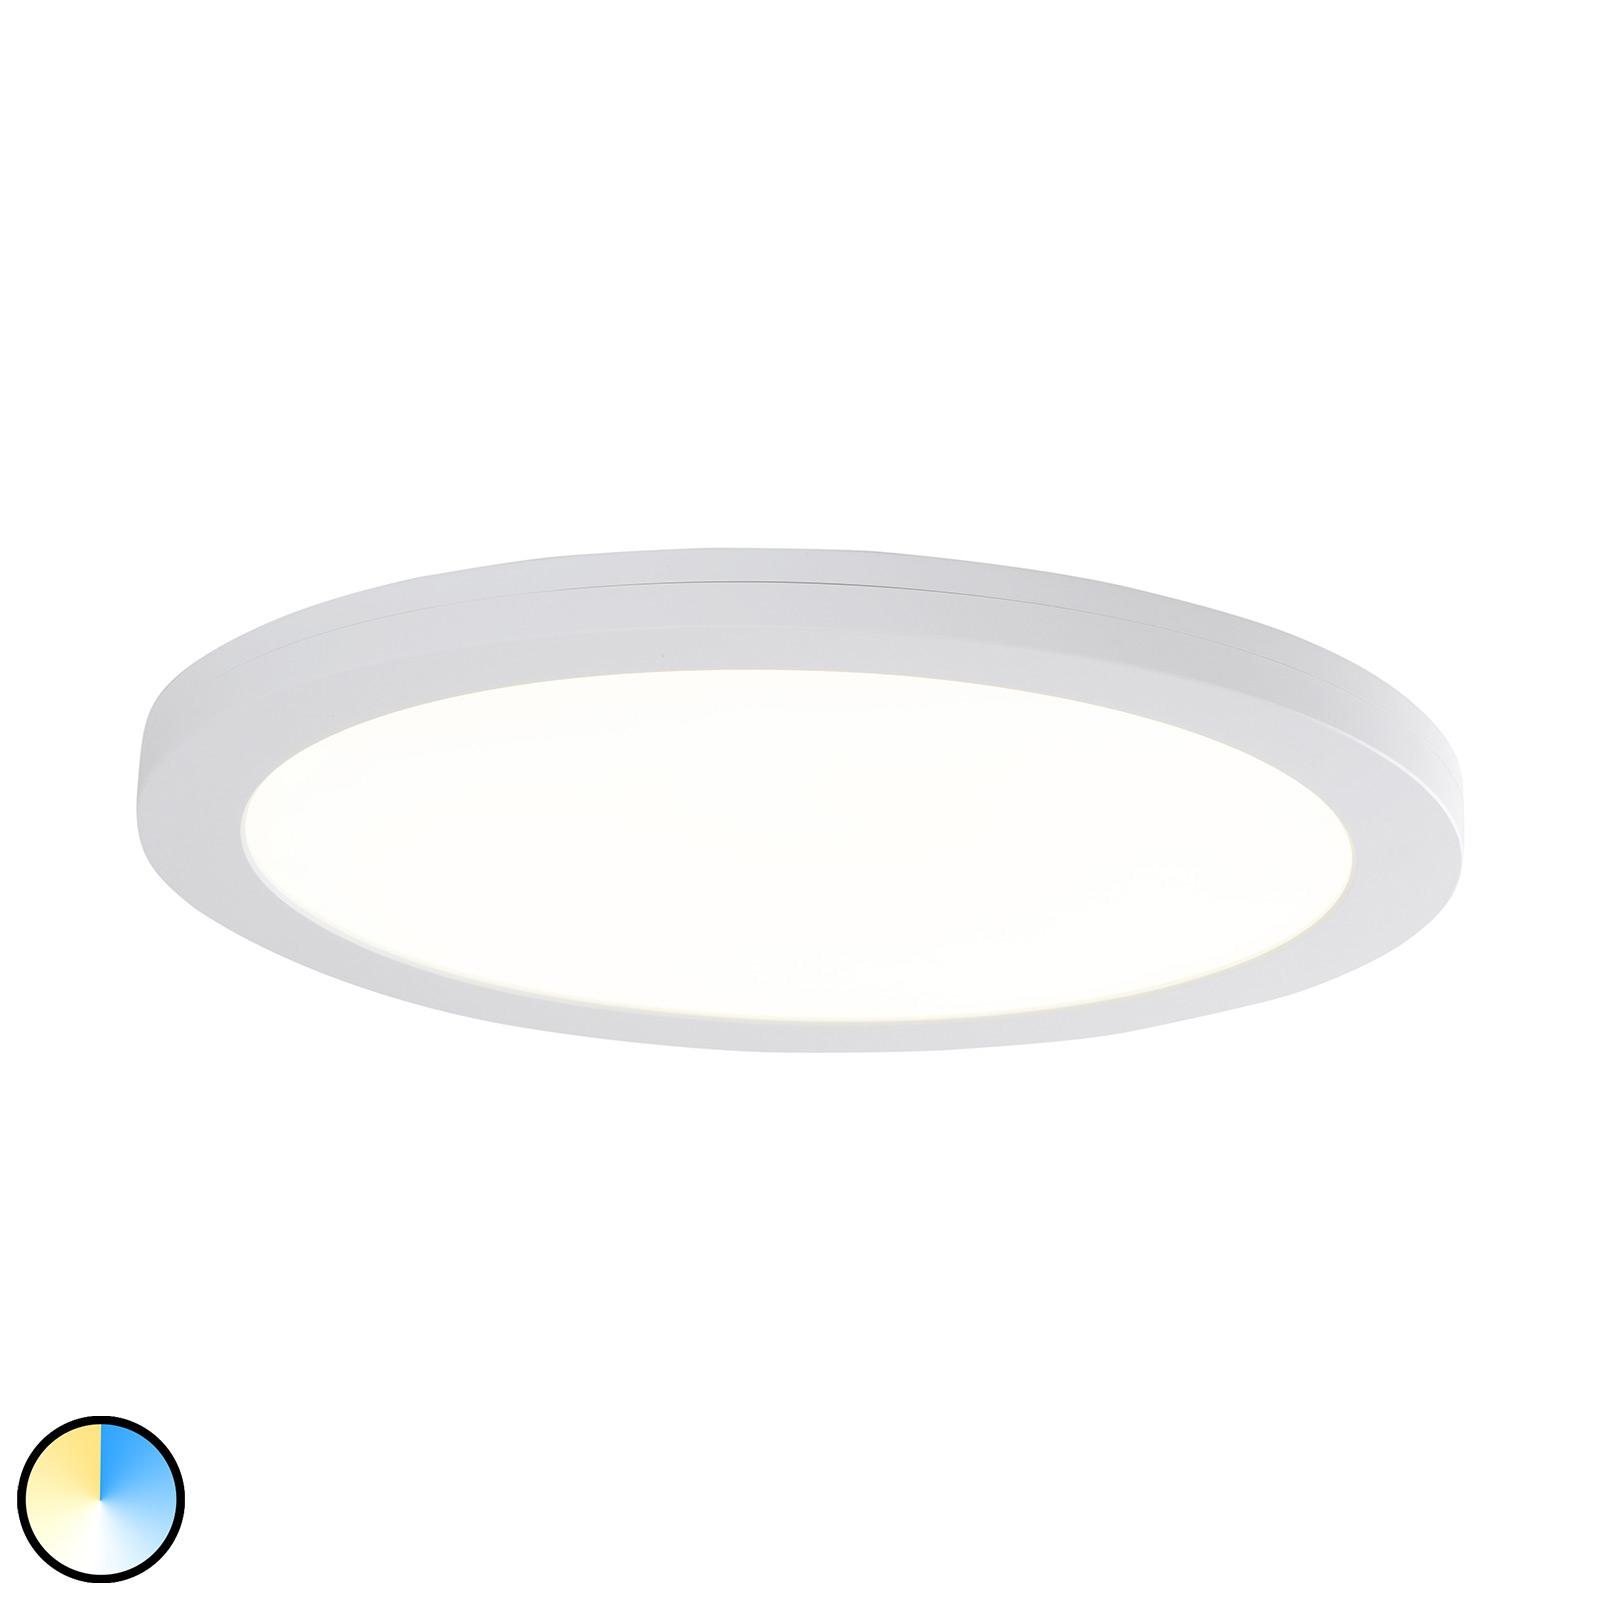 LED-uppovalaisin Bonus, halkaisija 33 cm